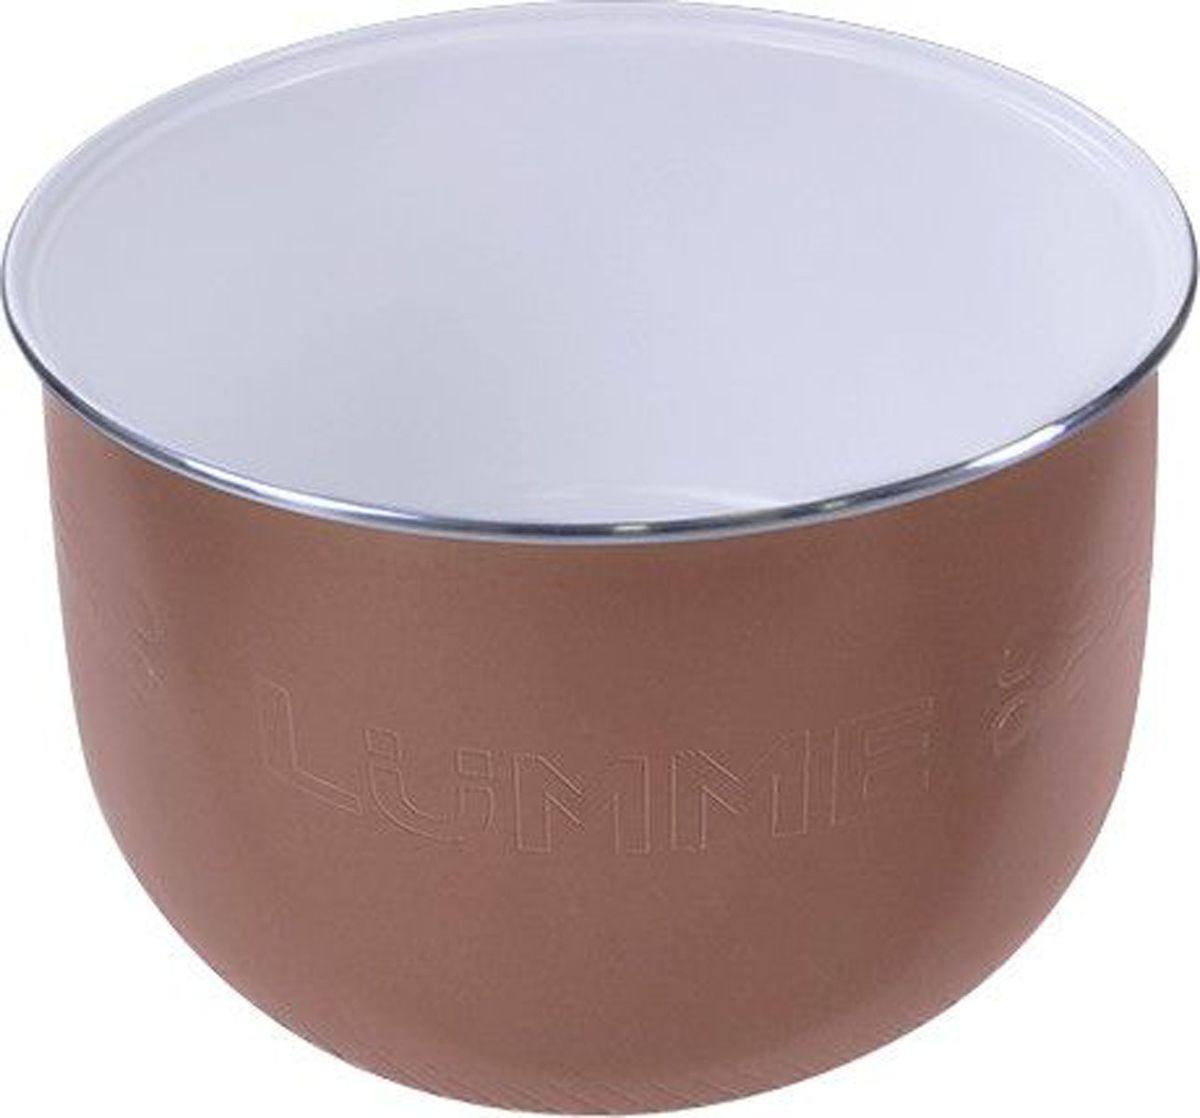 Lumme LU-MC301 Сeramic, White чаша для мультиварки, 5 л чаша горошек 2 л бел син 1150426